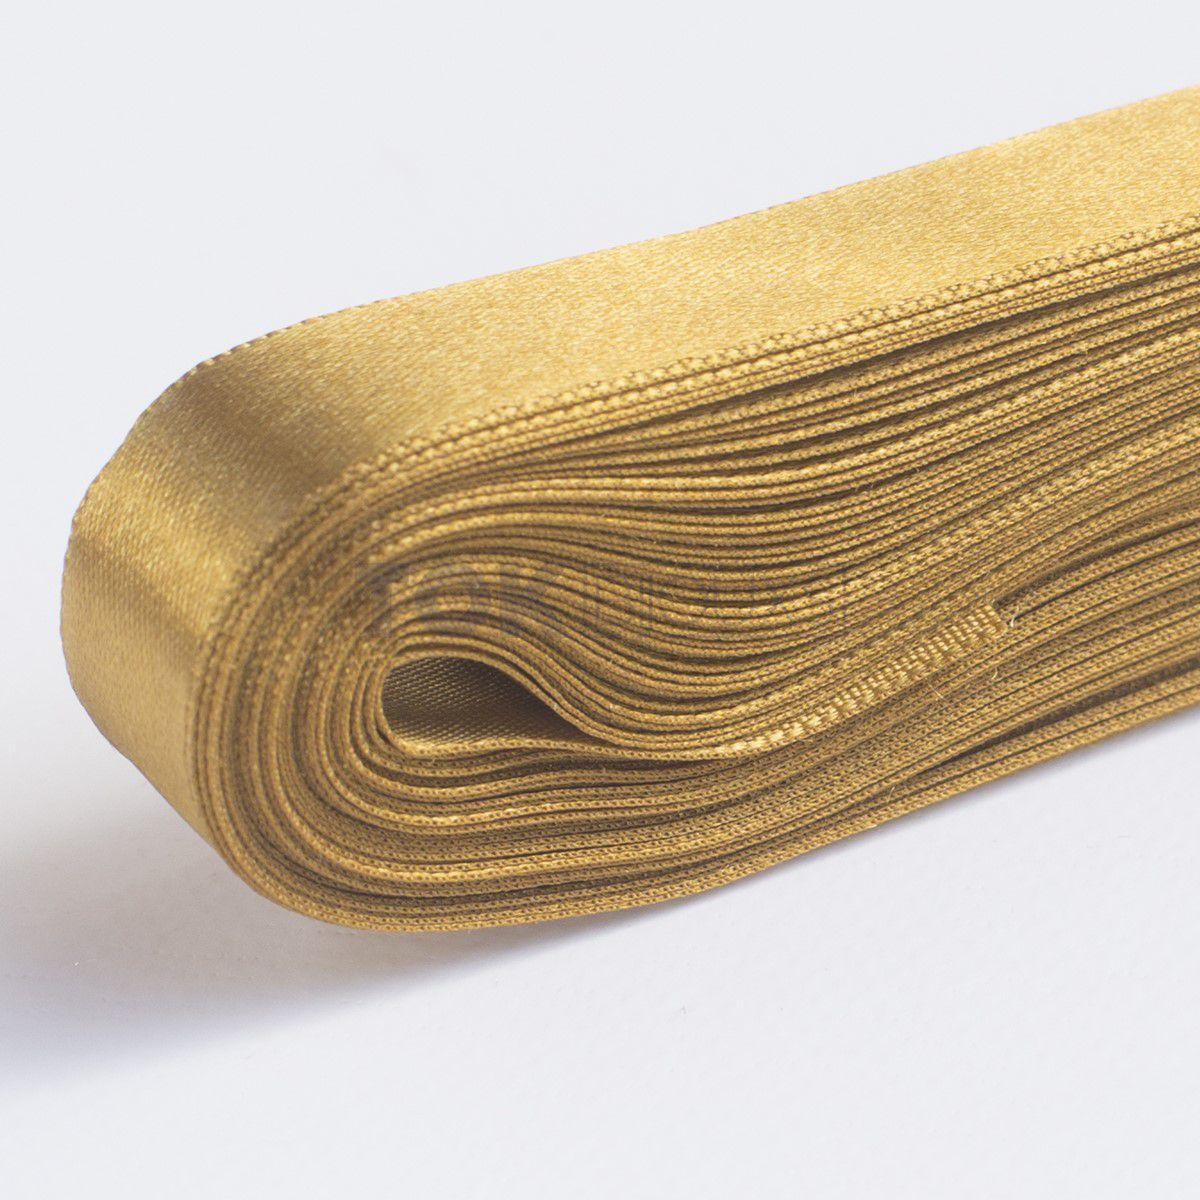 Fita Cetim N.9 - 38mm - 10 Metros - COR (47) Dourado